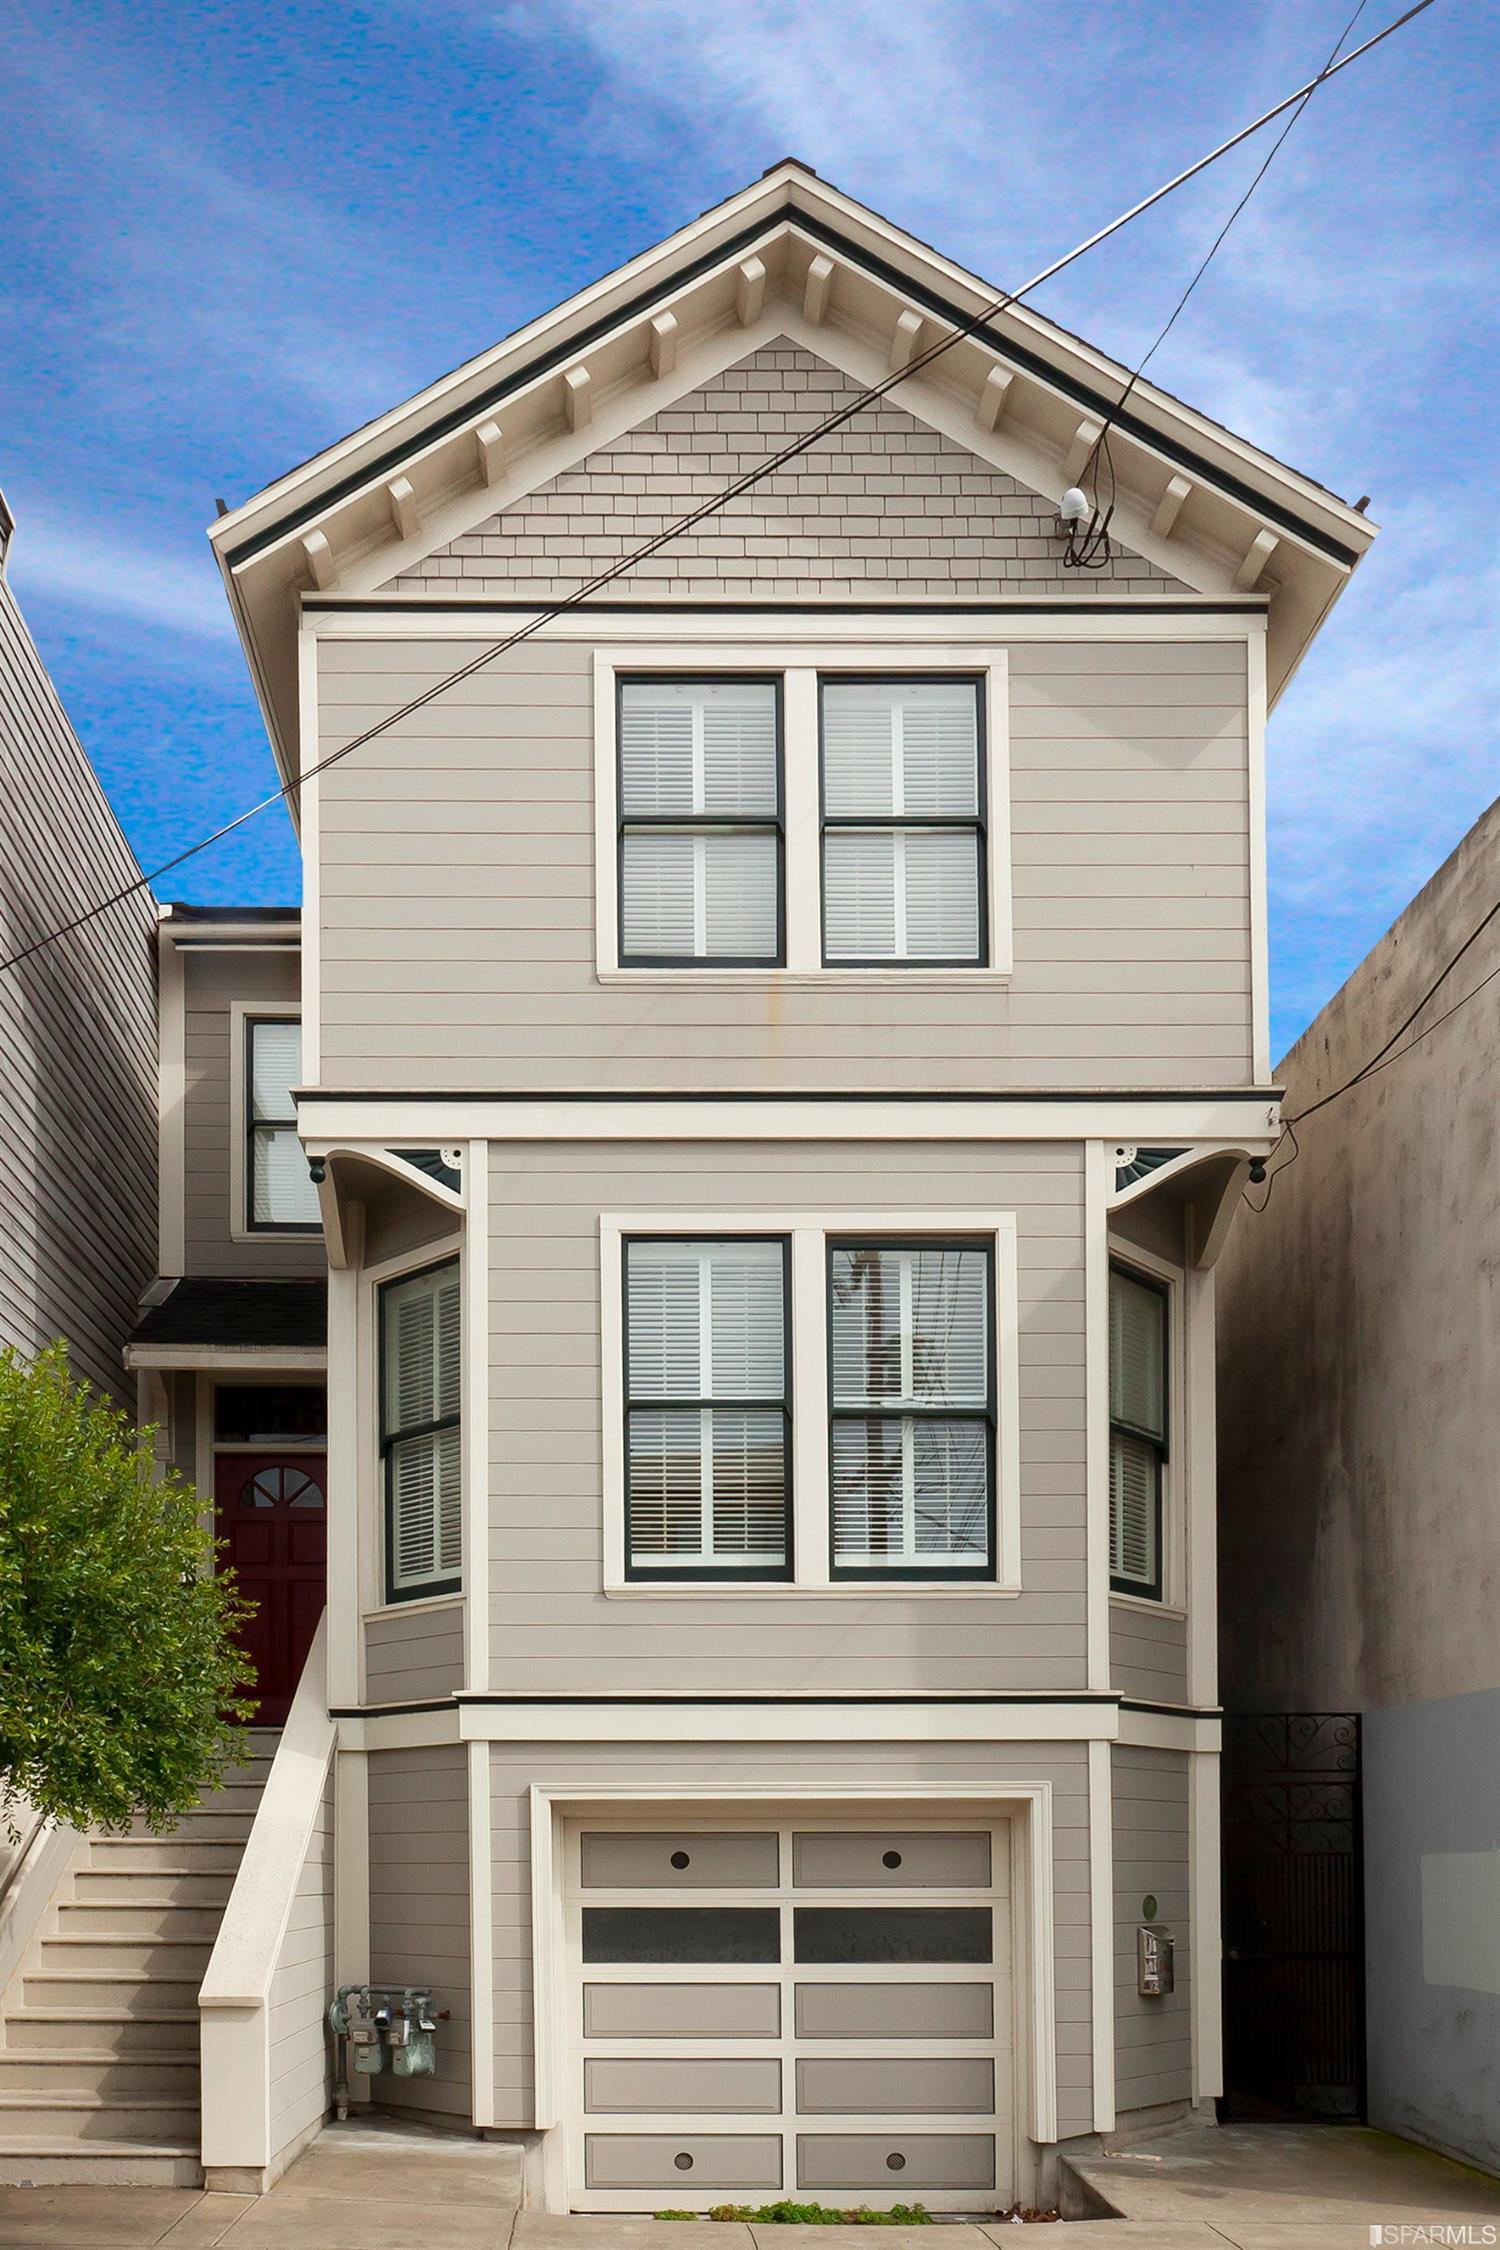 376 10th Ave, San Francisco, CA 94118